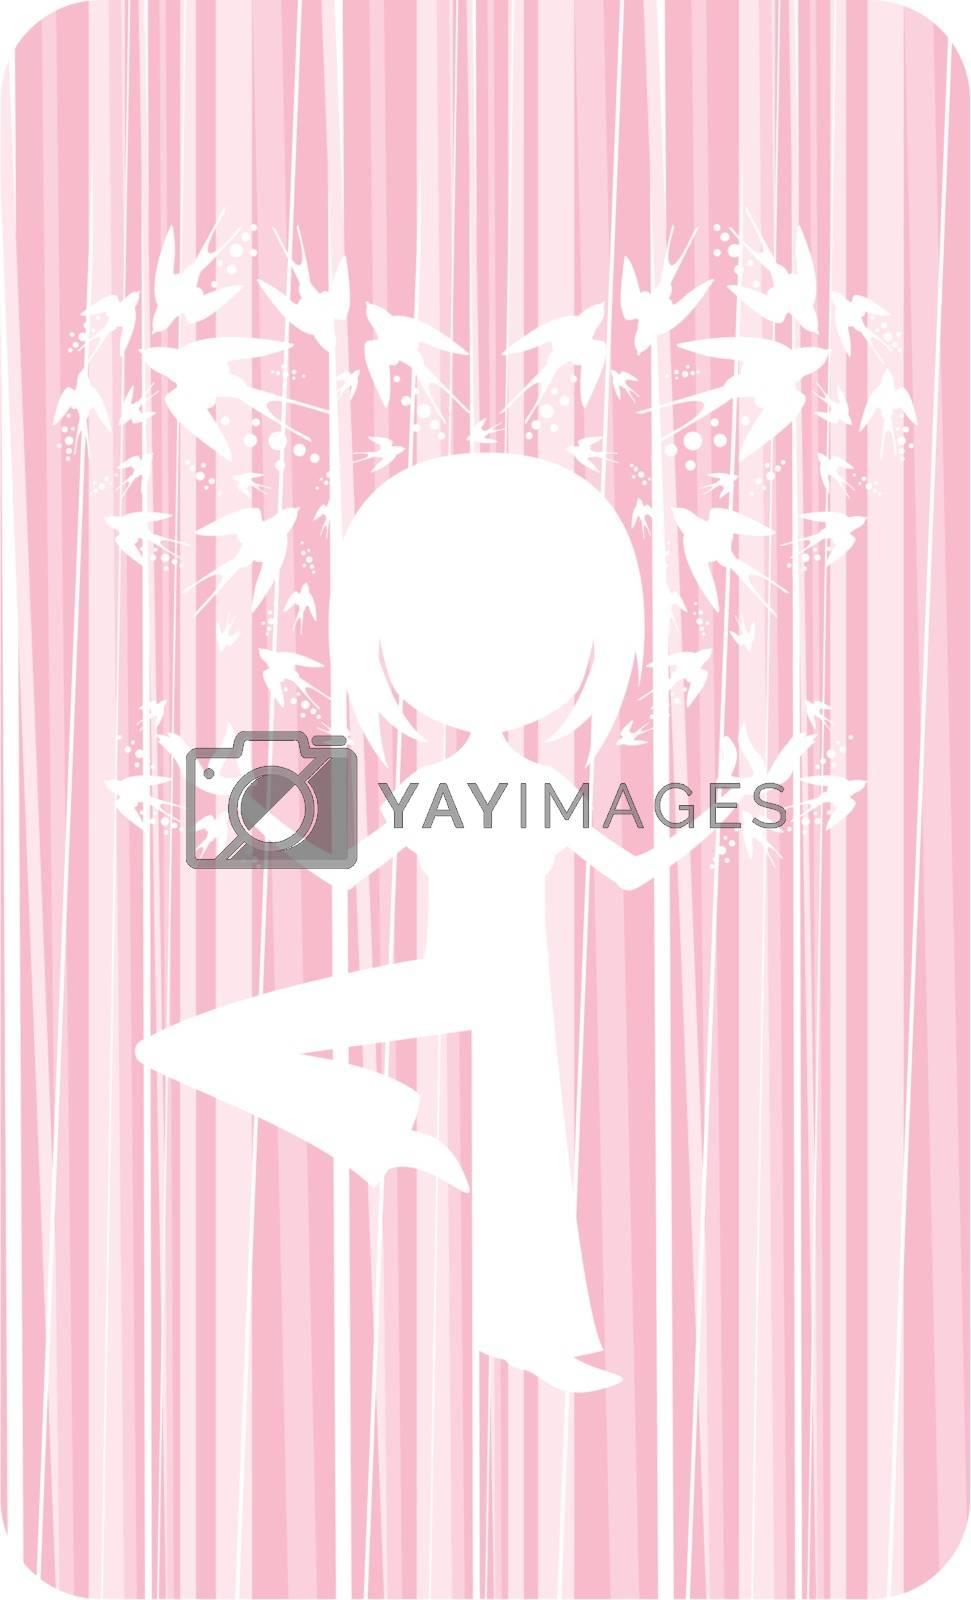 Cute Yoga Girl with Swallows by markmurphycreative